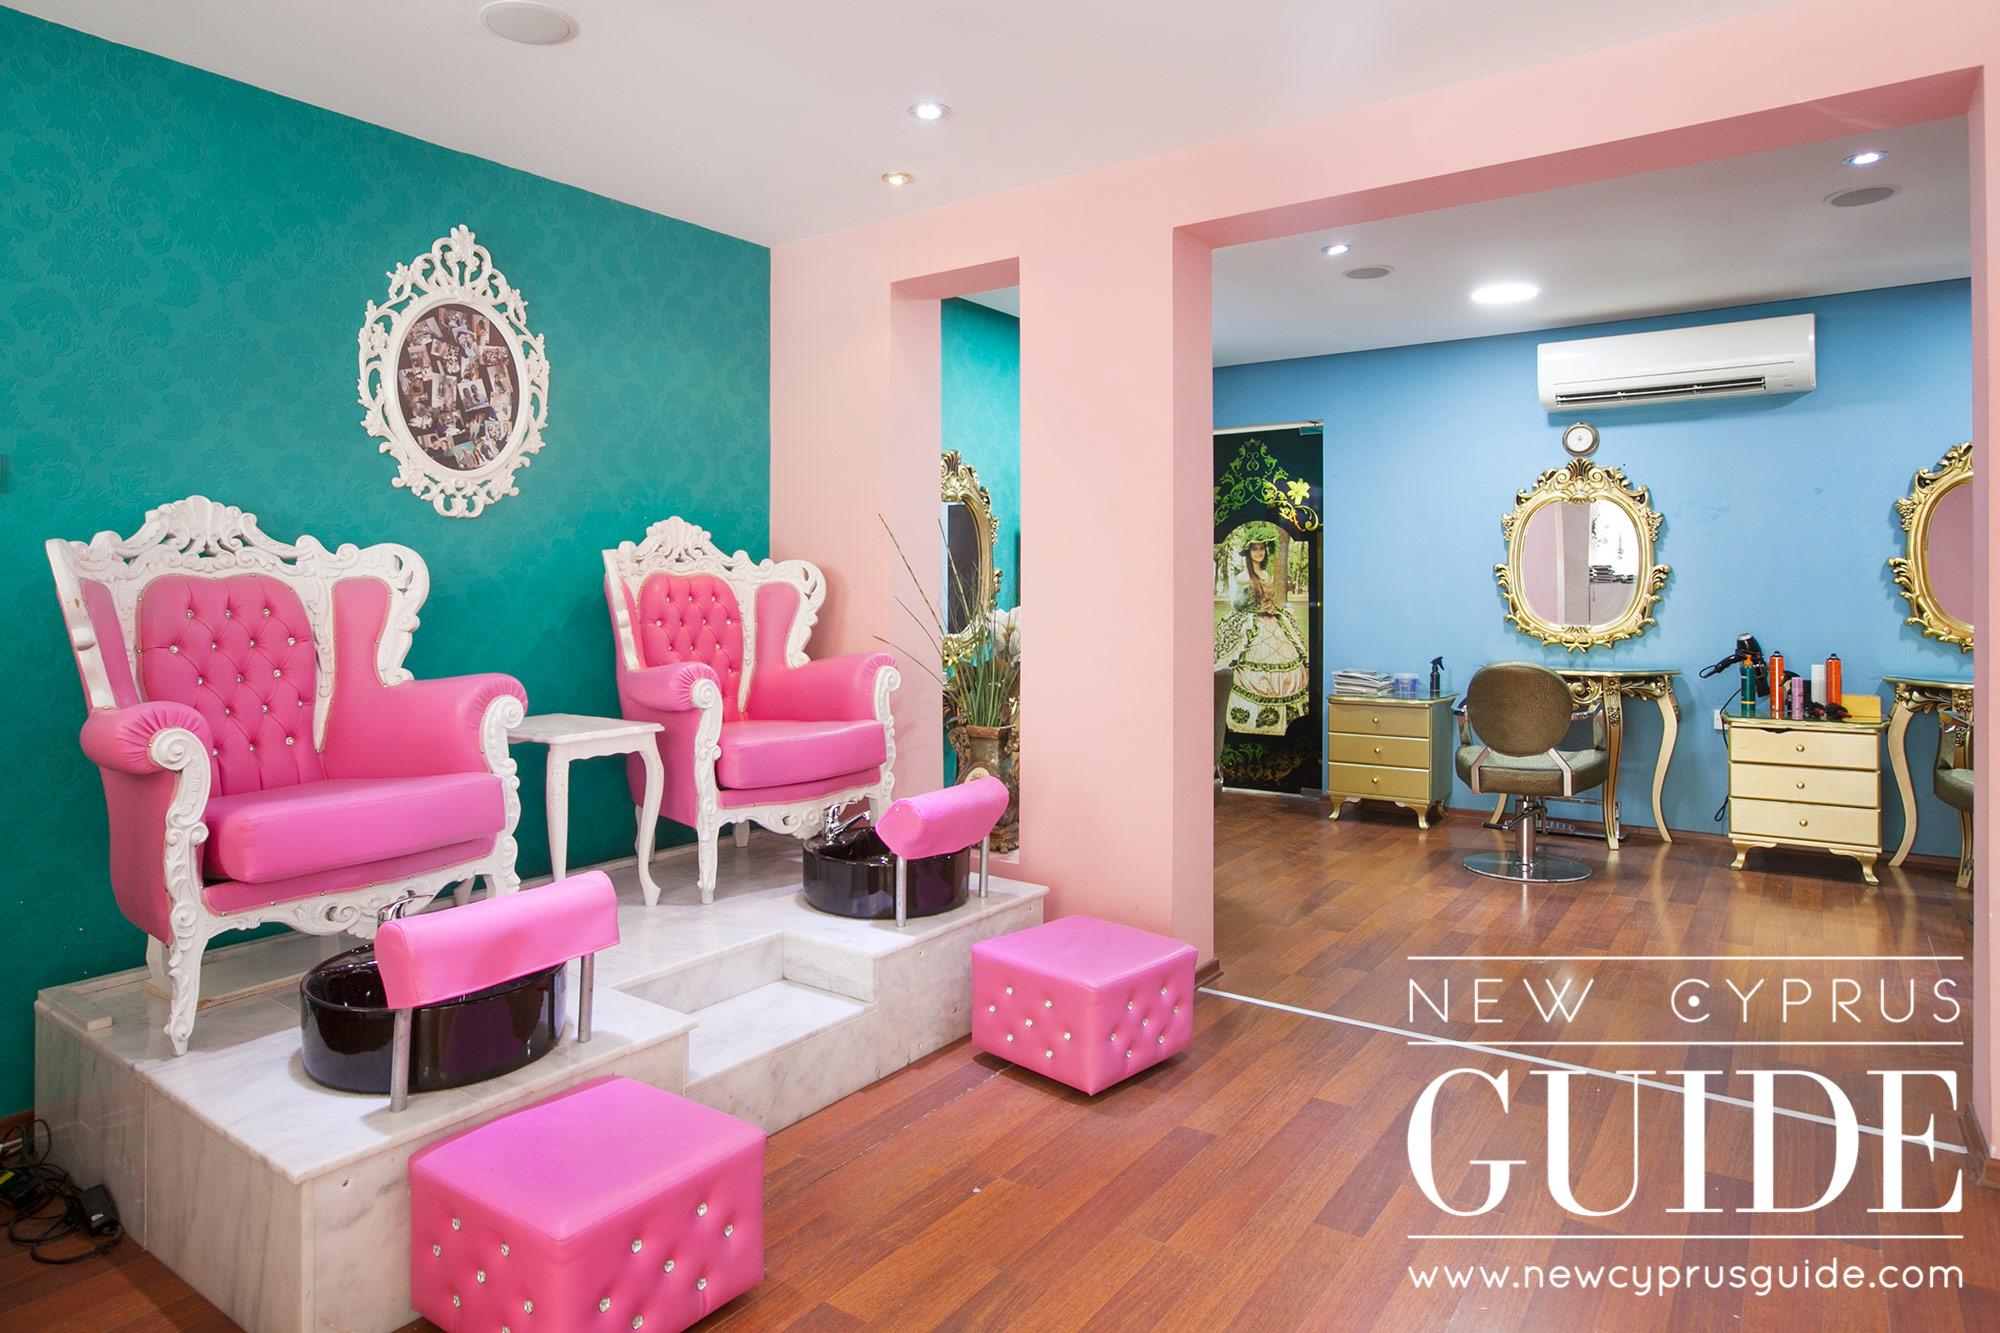 Velena Hair Beauty & Nail Salon – New Cyprus Guide